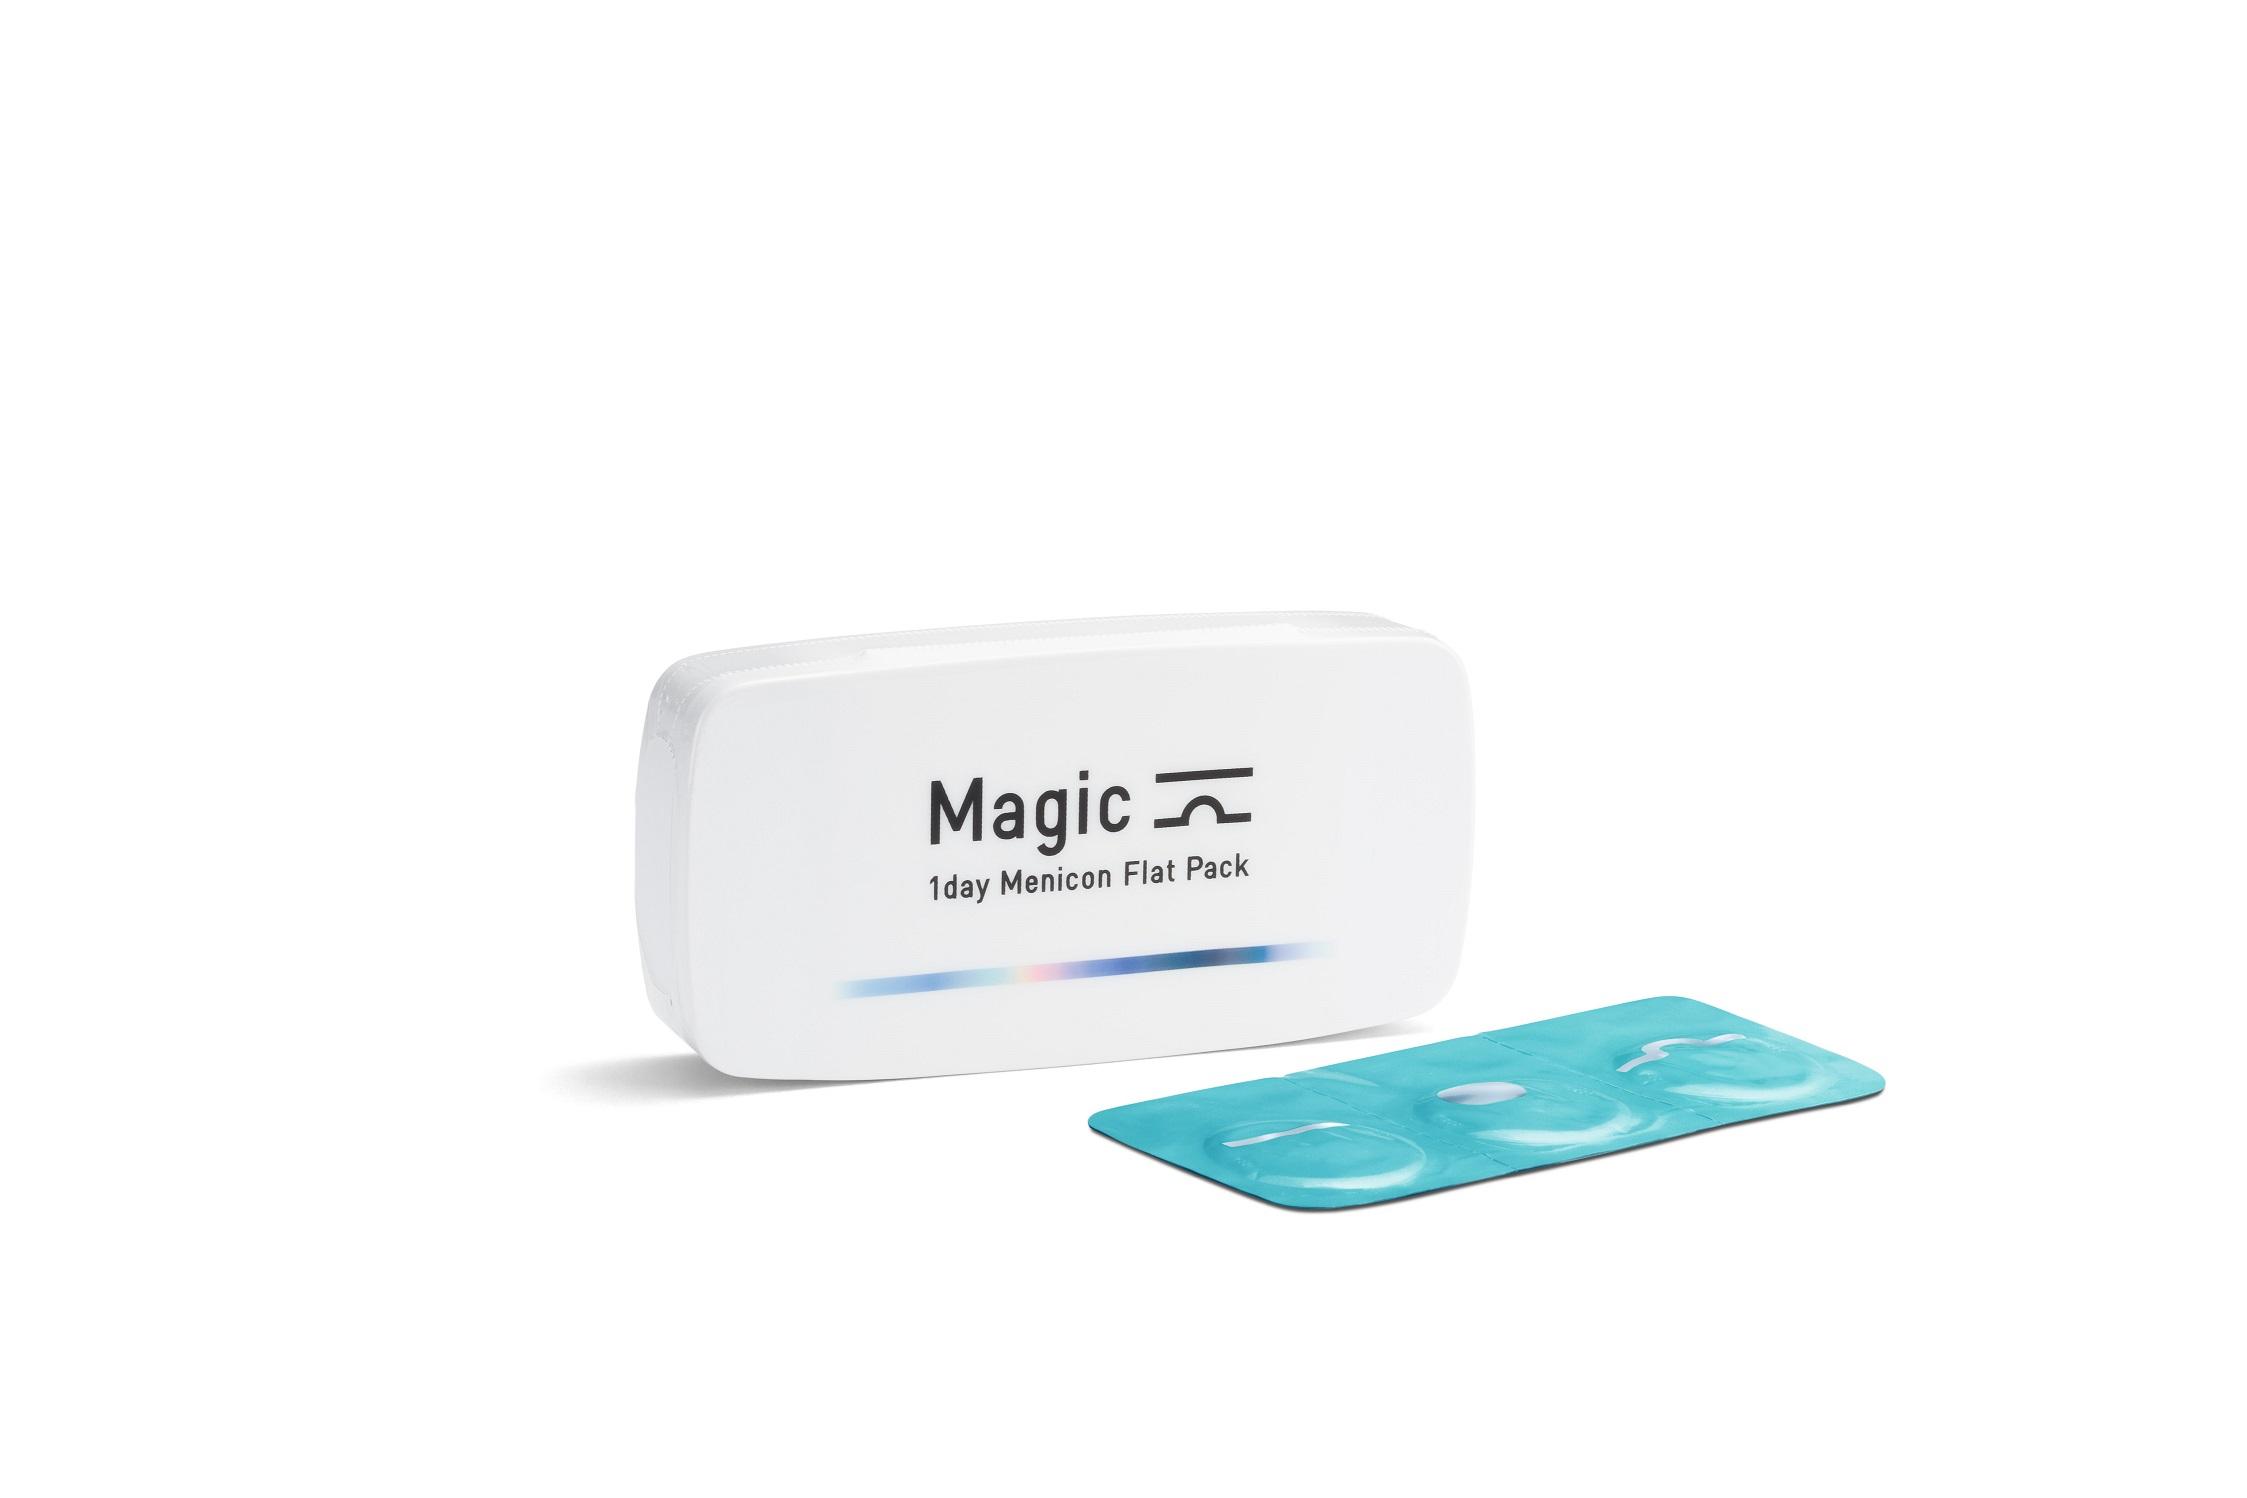 03_Magic_斜め_一次包装.jpg